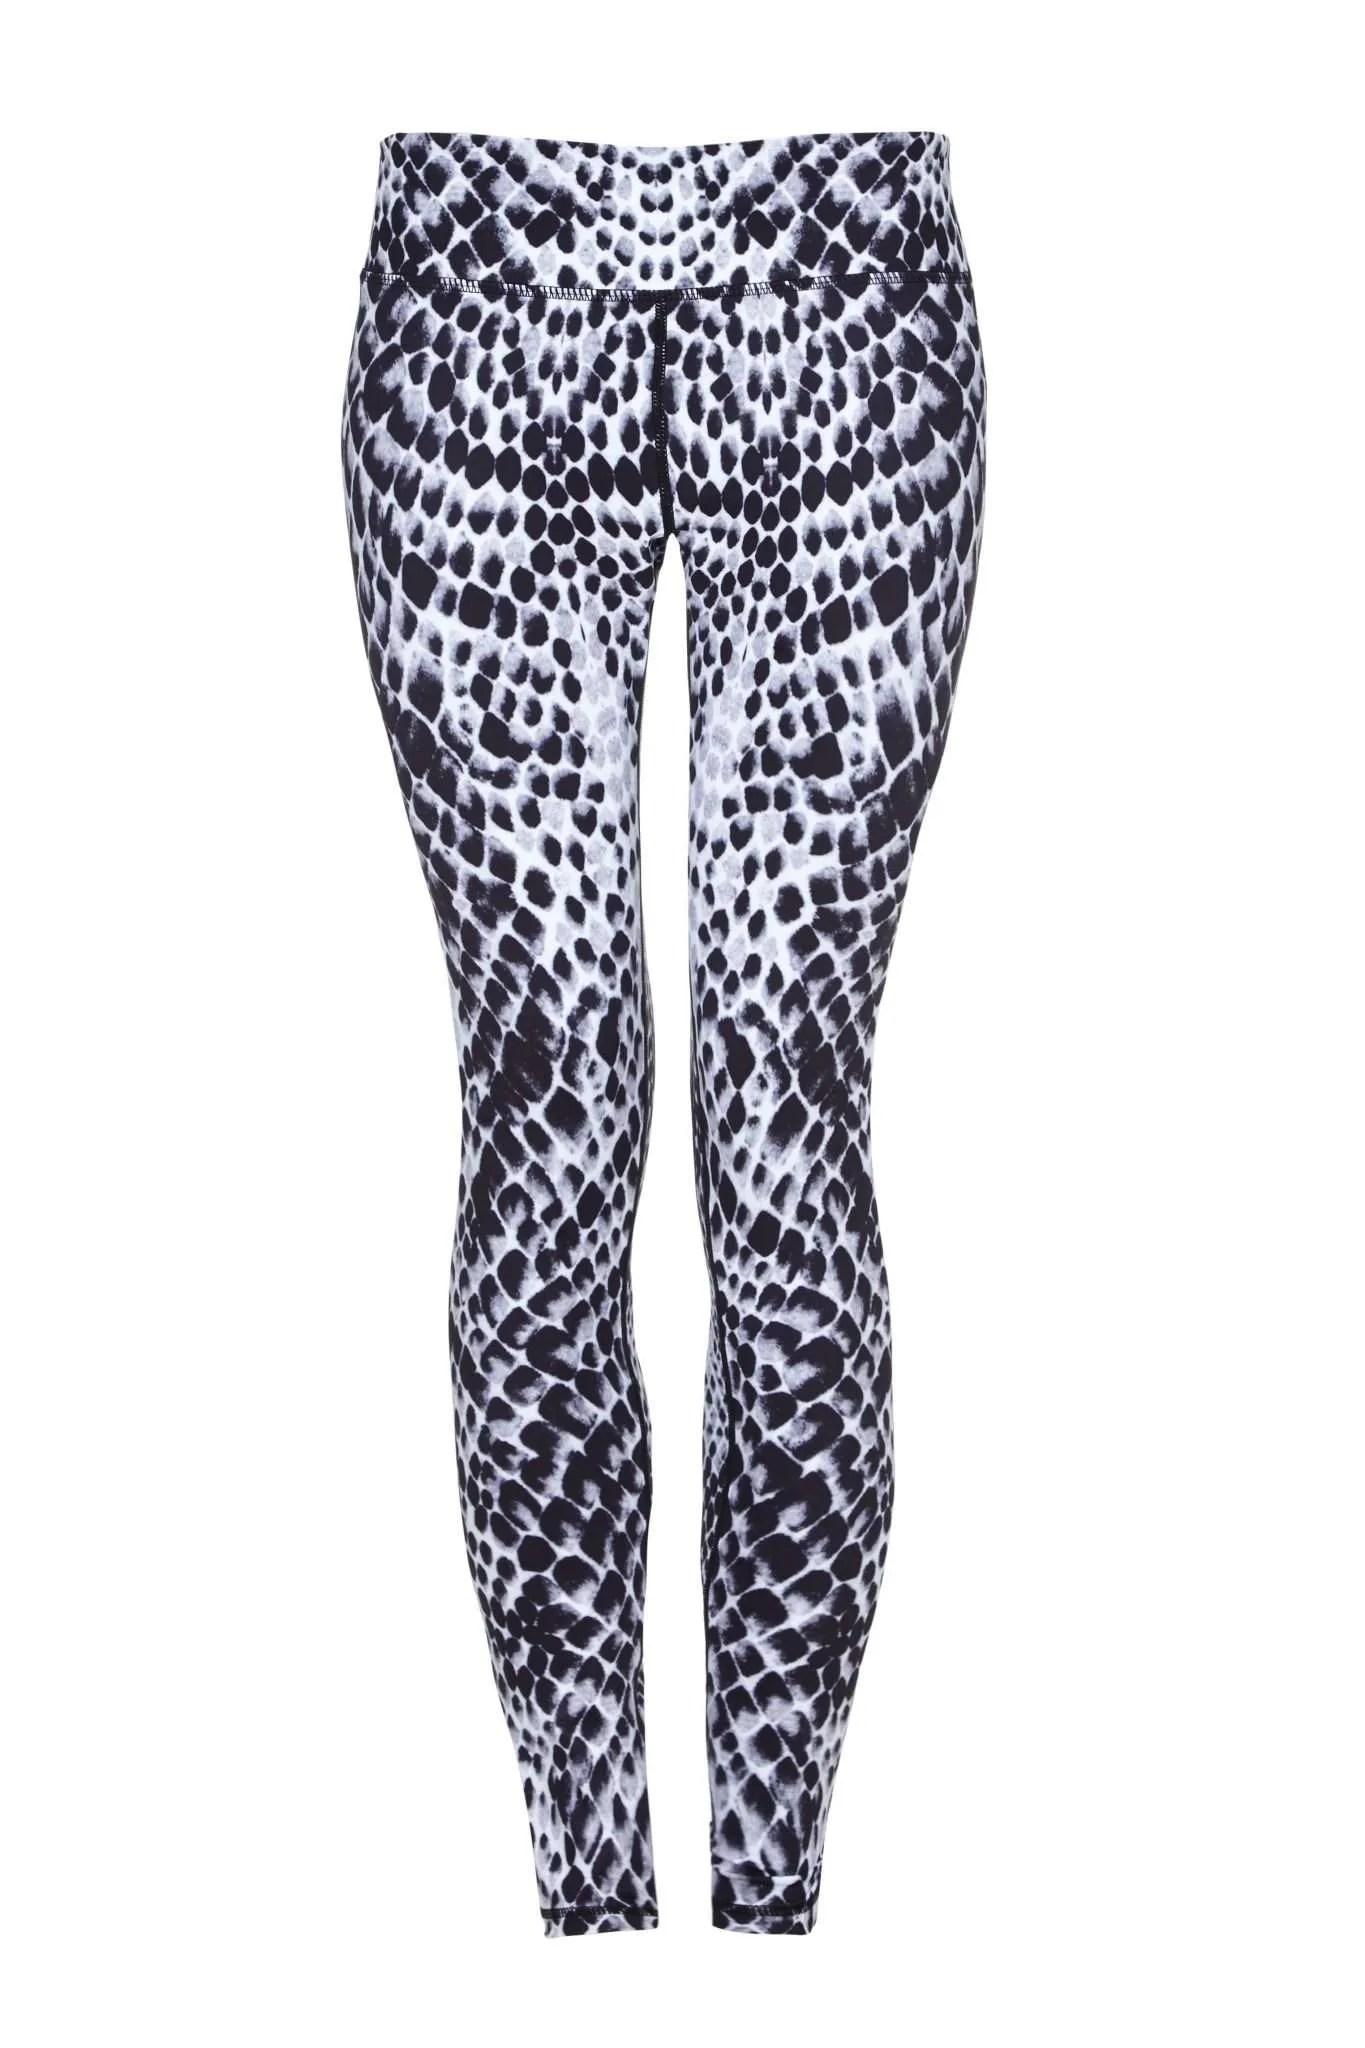 Full Length Workout Yoga Pants with Snake Print BSP Womens High Waist Leggings